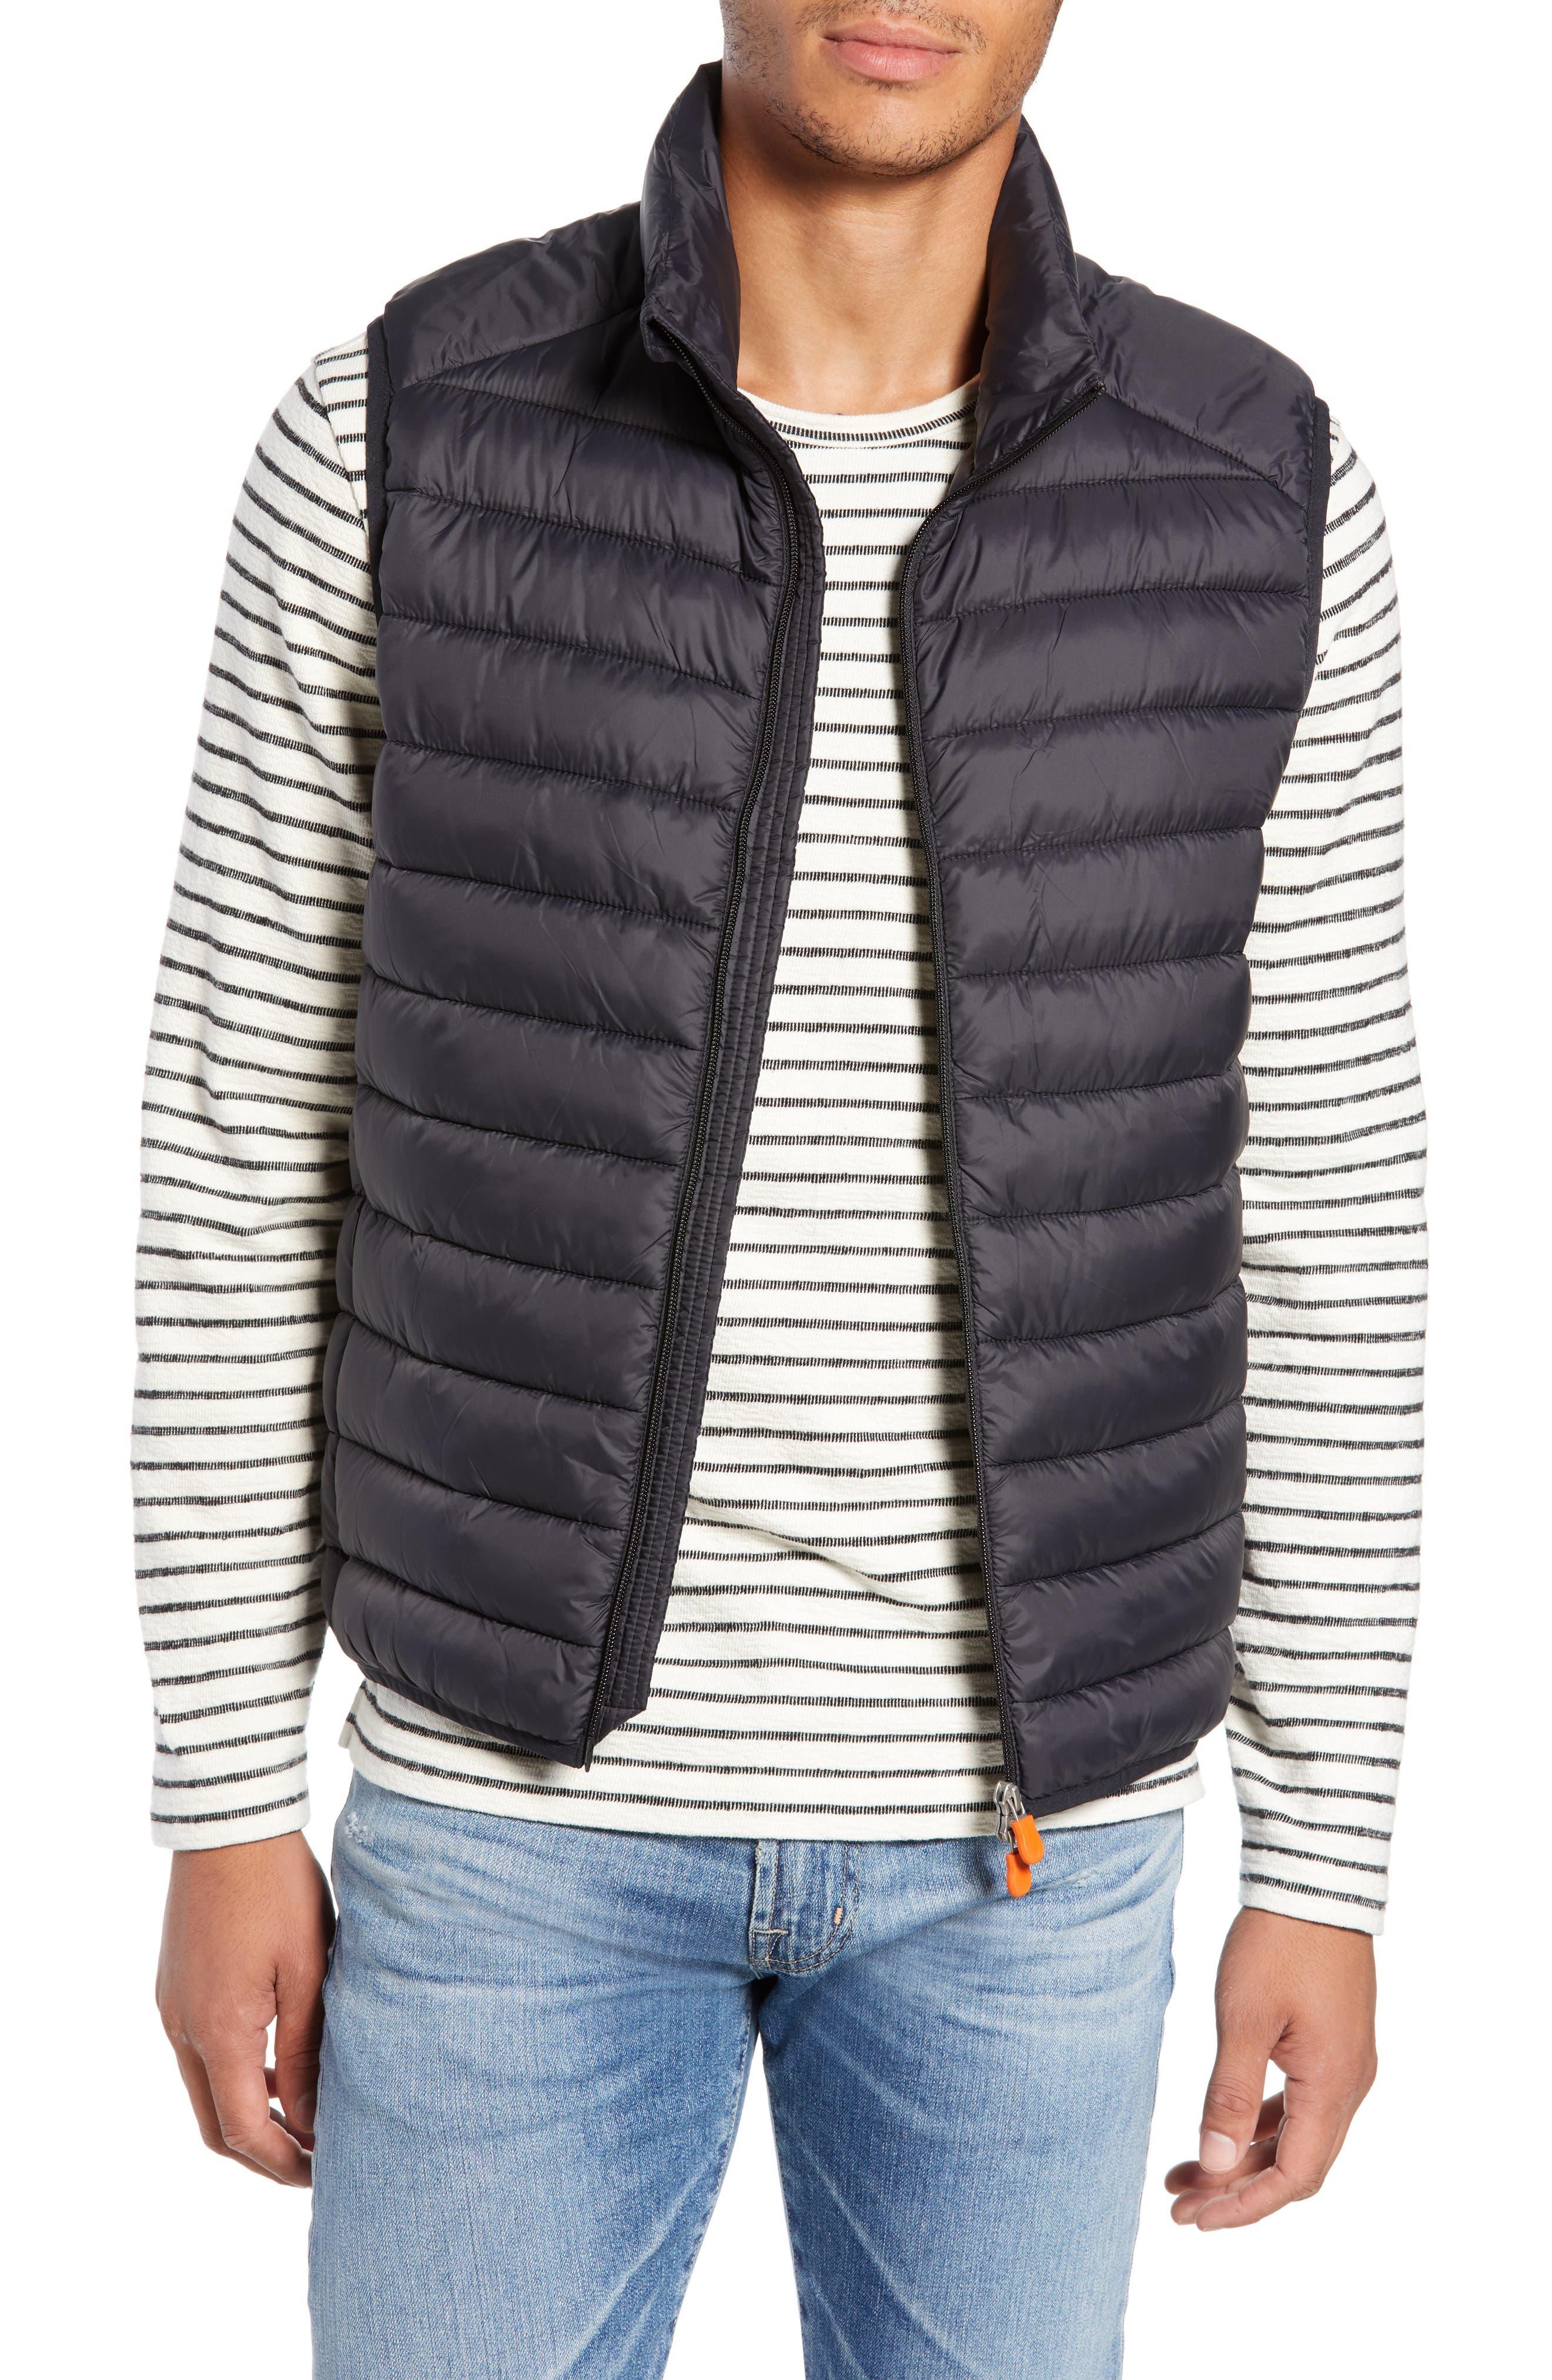 Save The Duck Lightweight Packable Vest, Black